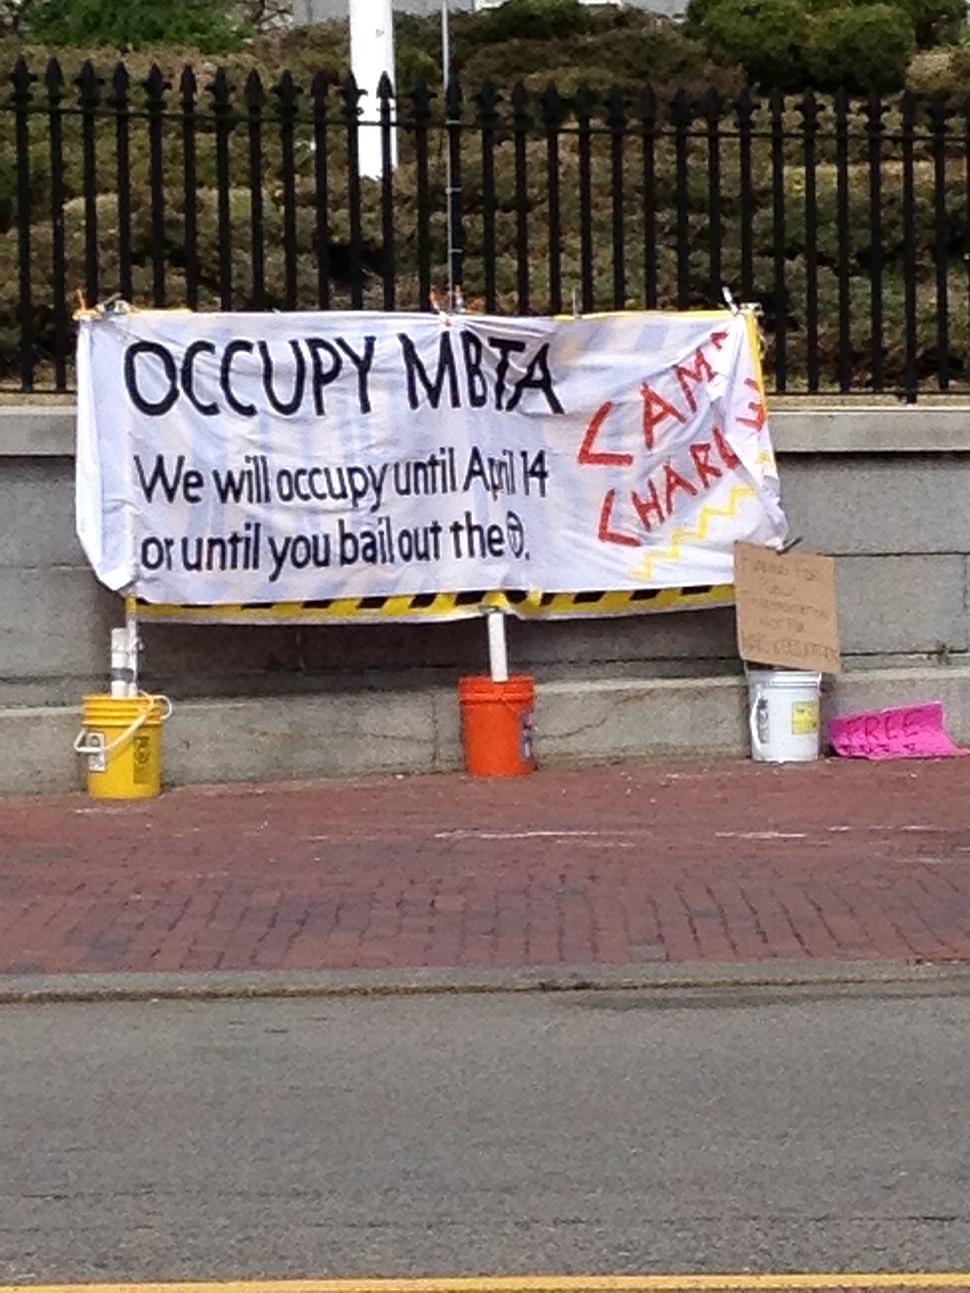 Occupy MBTA April 2012